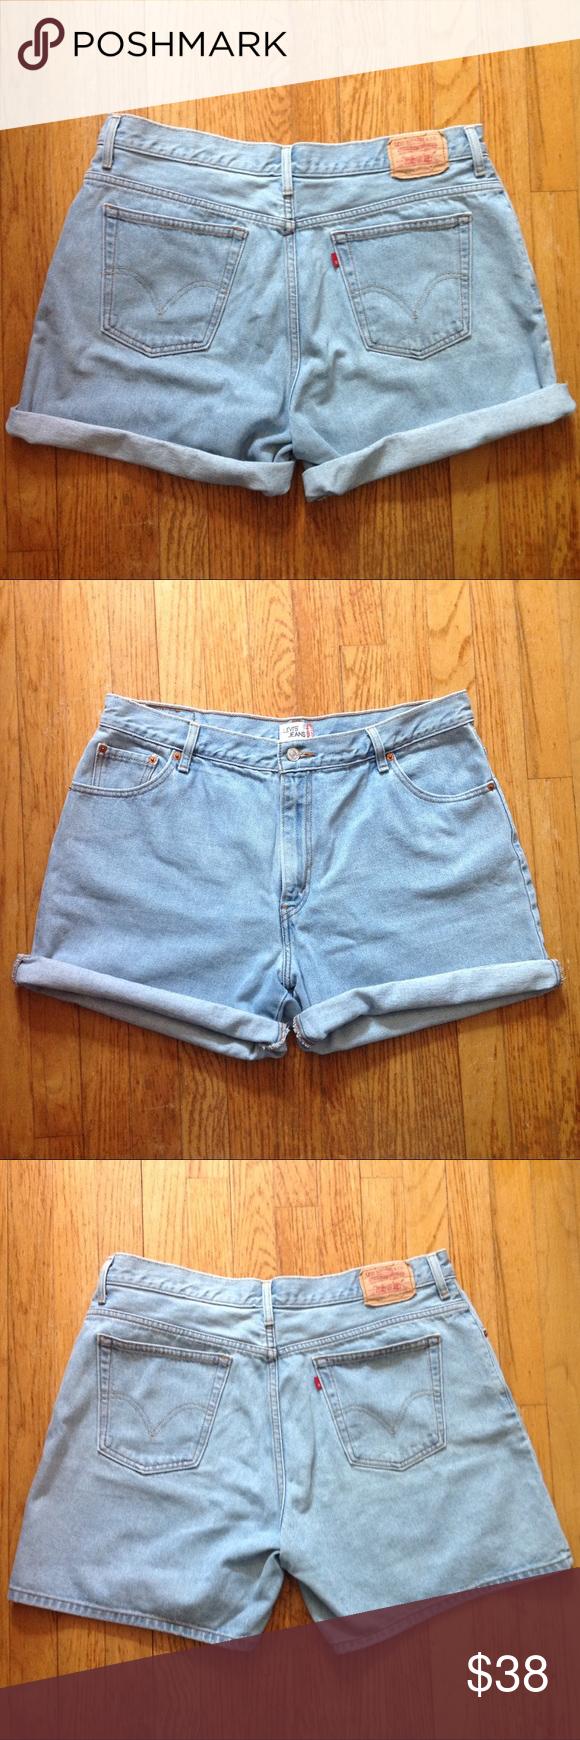 1784ef7d56 80s/90s LEVIS high waisted light wash mom shorts Description: Vintage Levis  are a